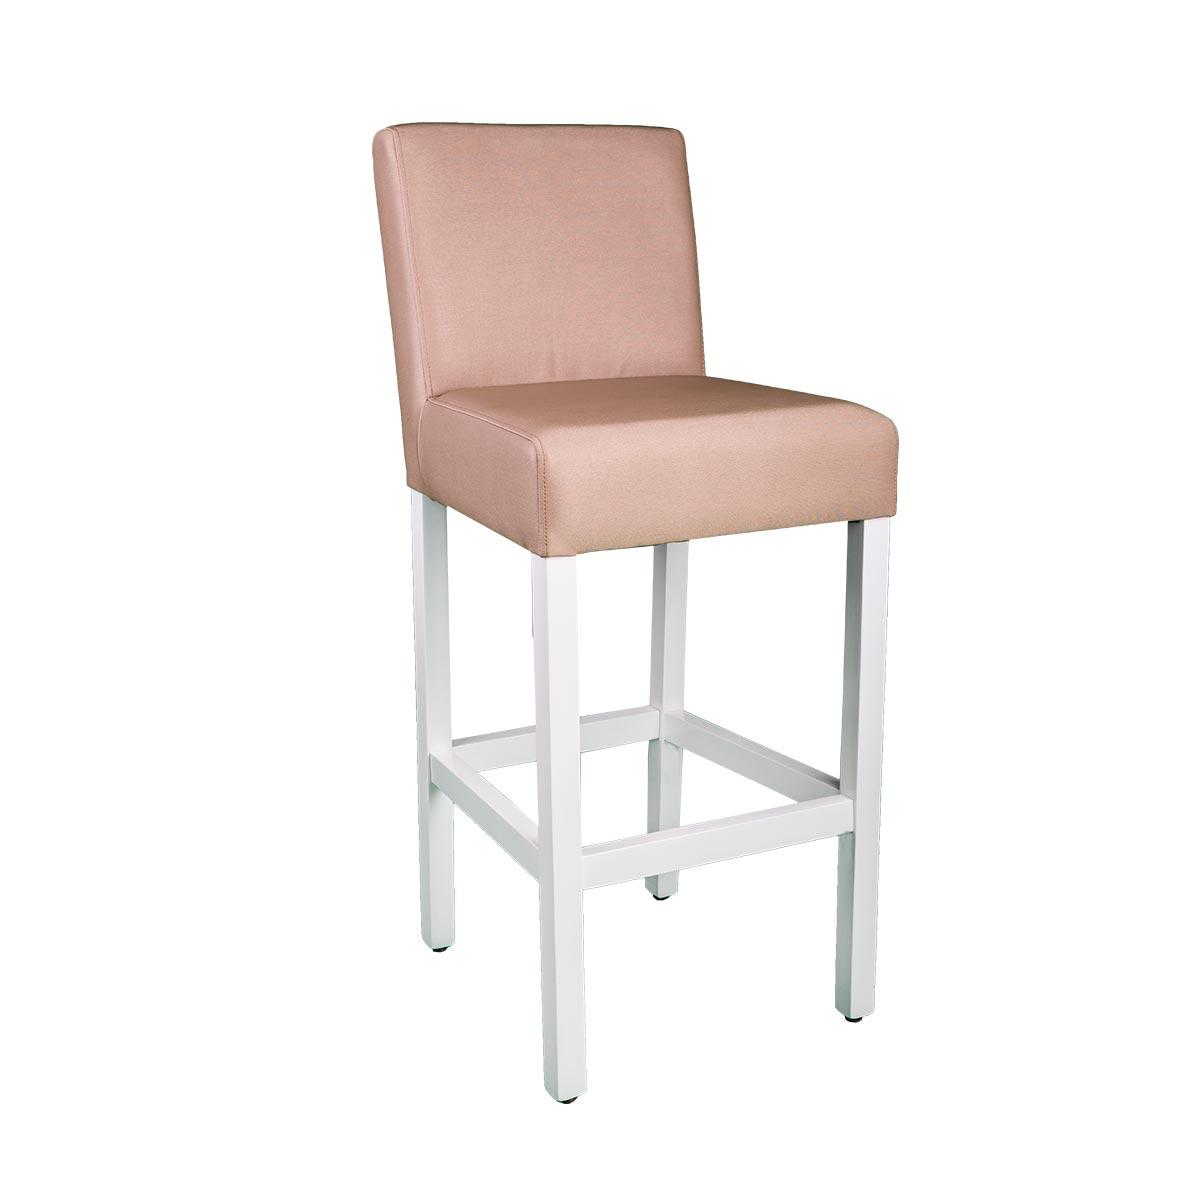 Nova Bar - Barska stolica - Detal stolice